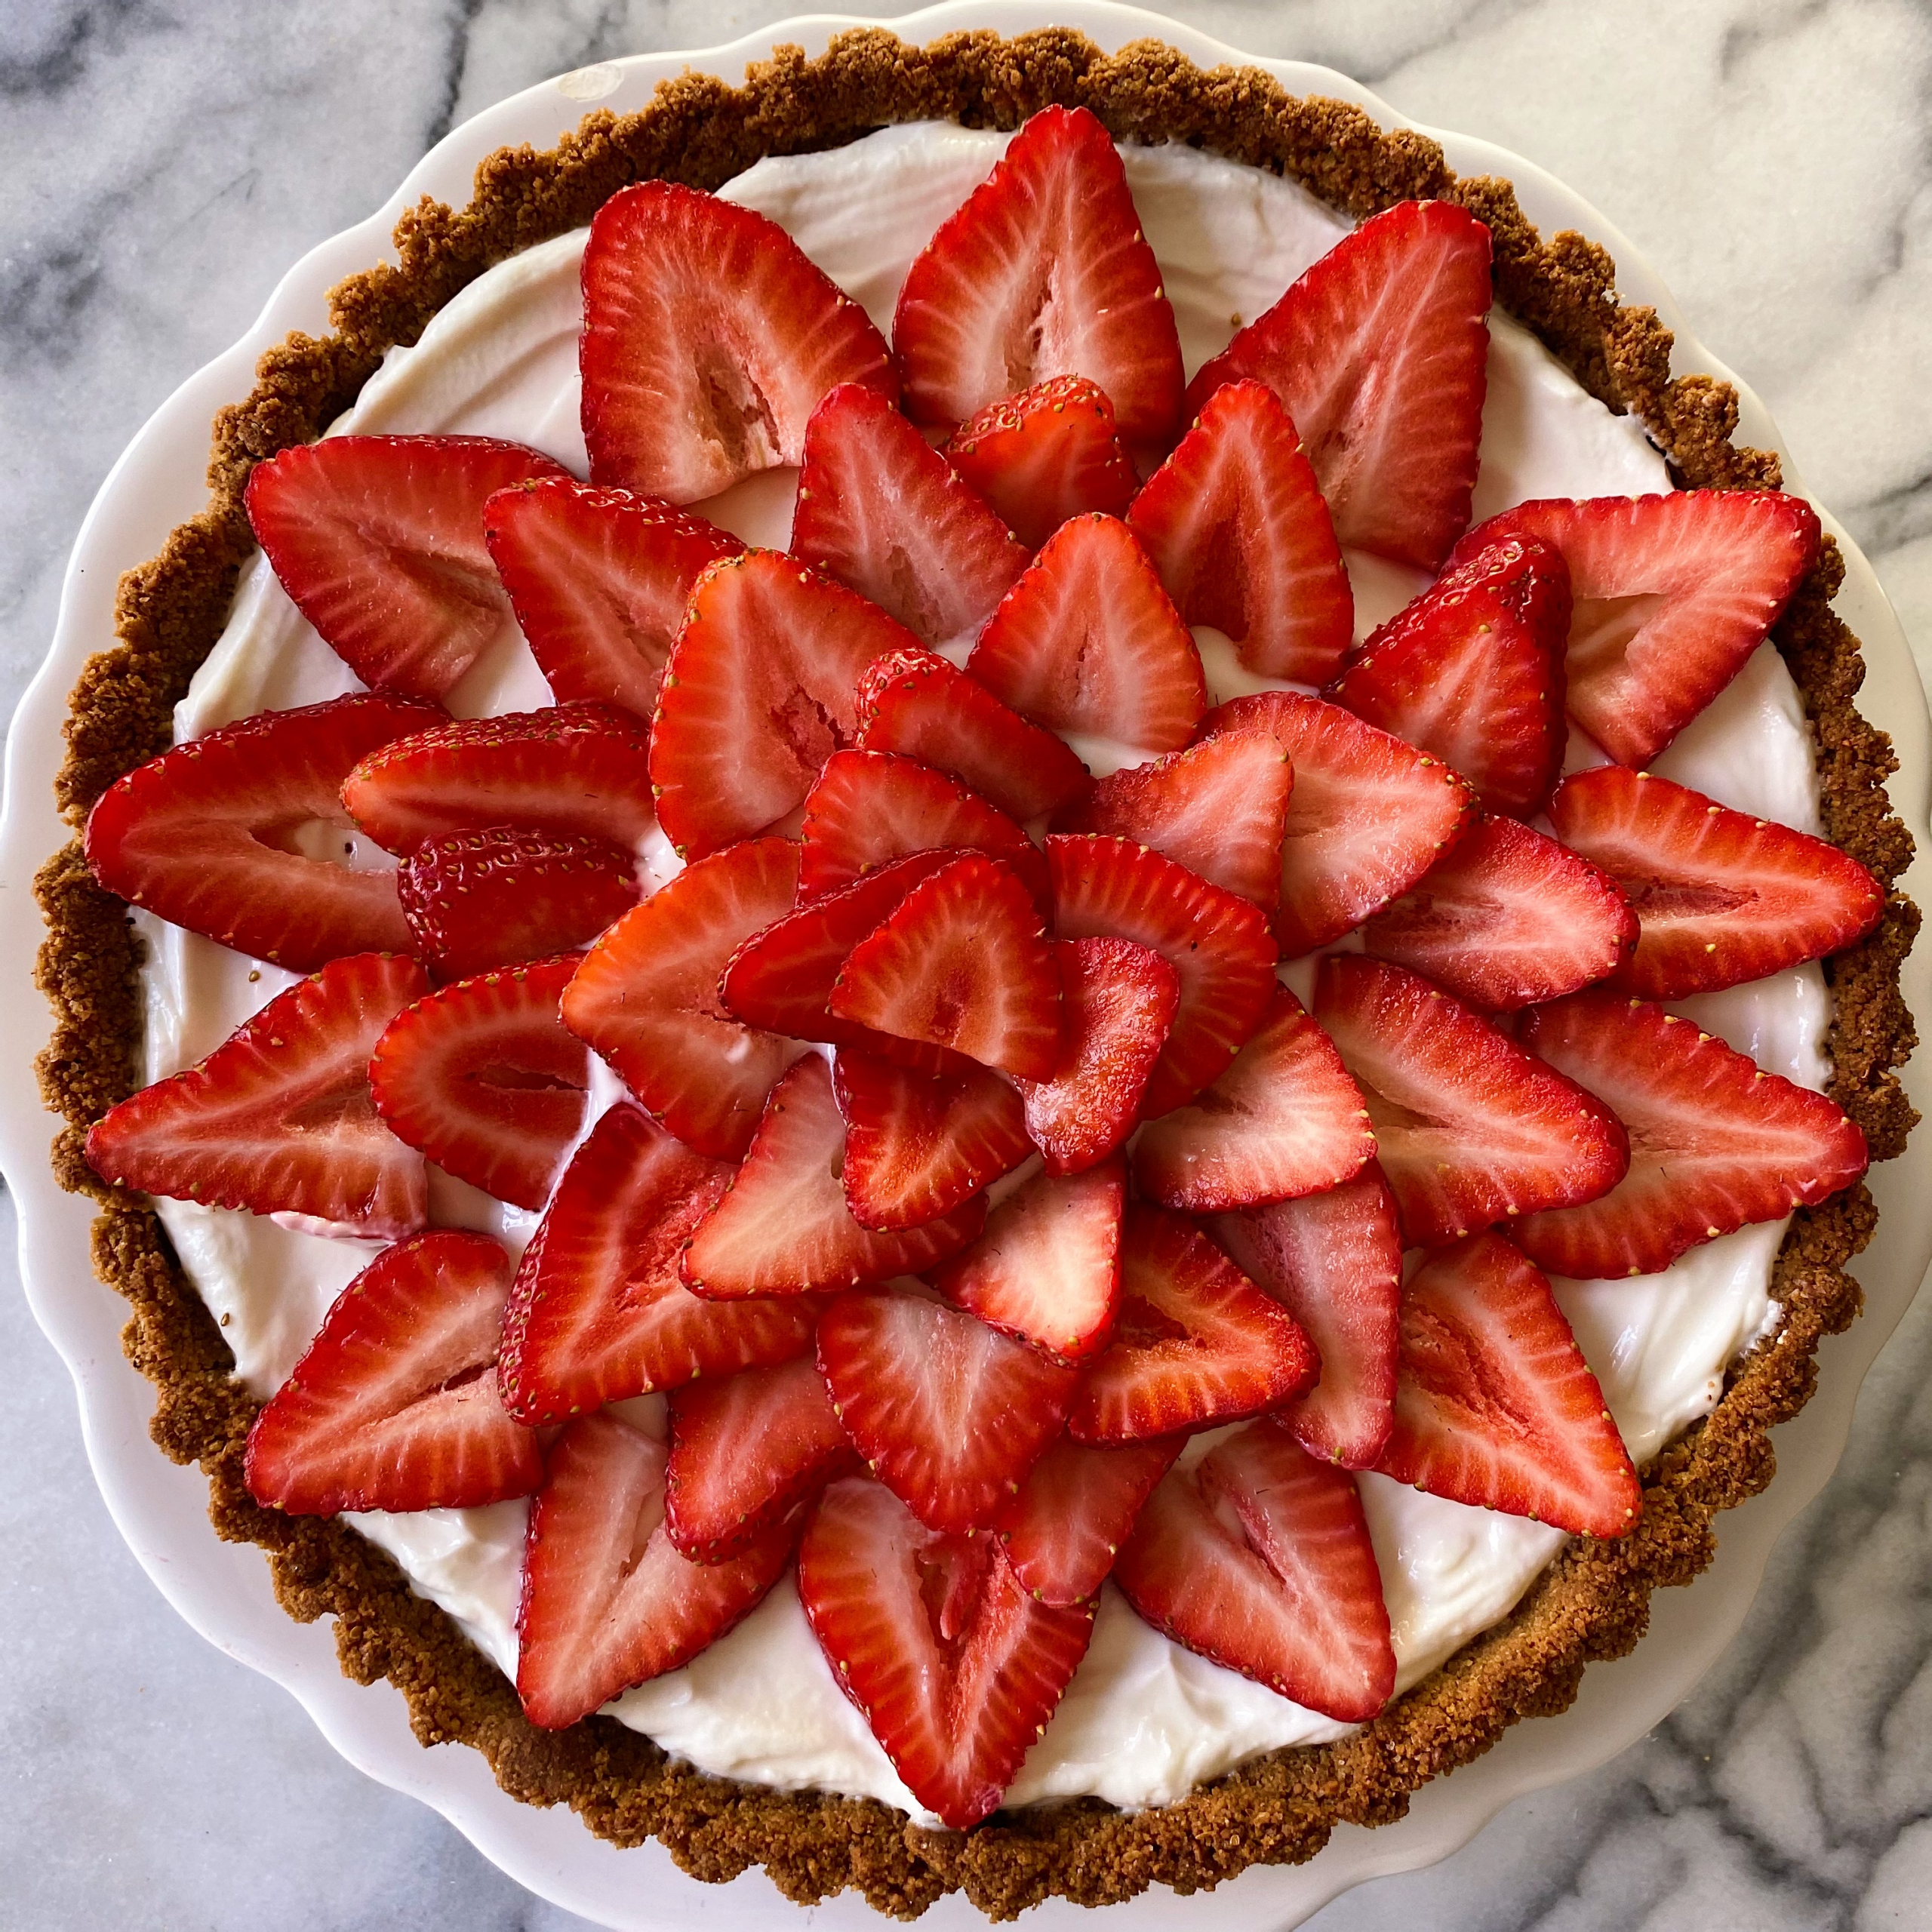 gluten-free Simple Strawberry Tart yogurt filling www.healthygffamily.com